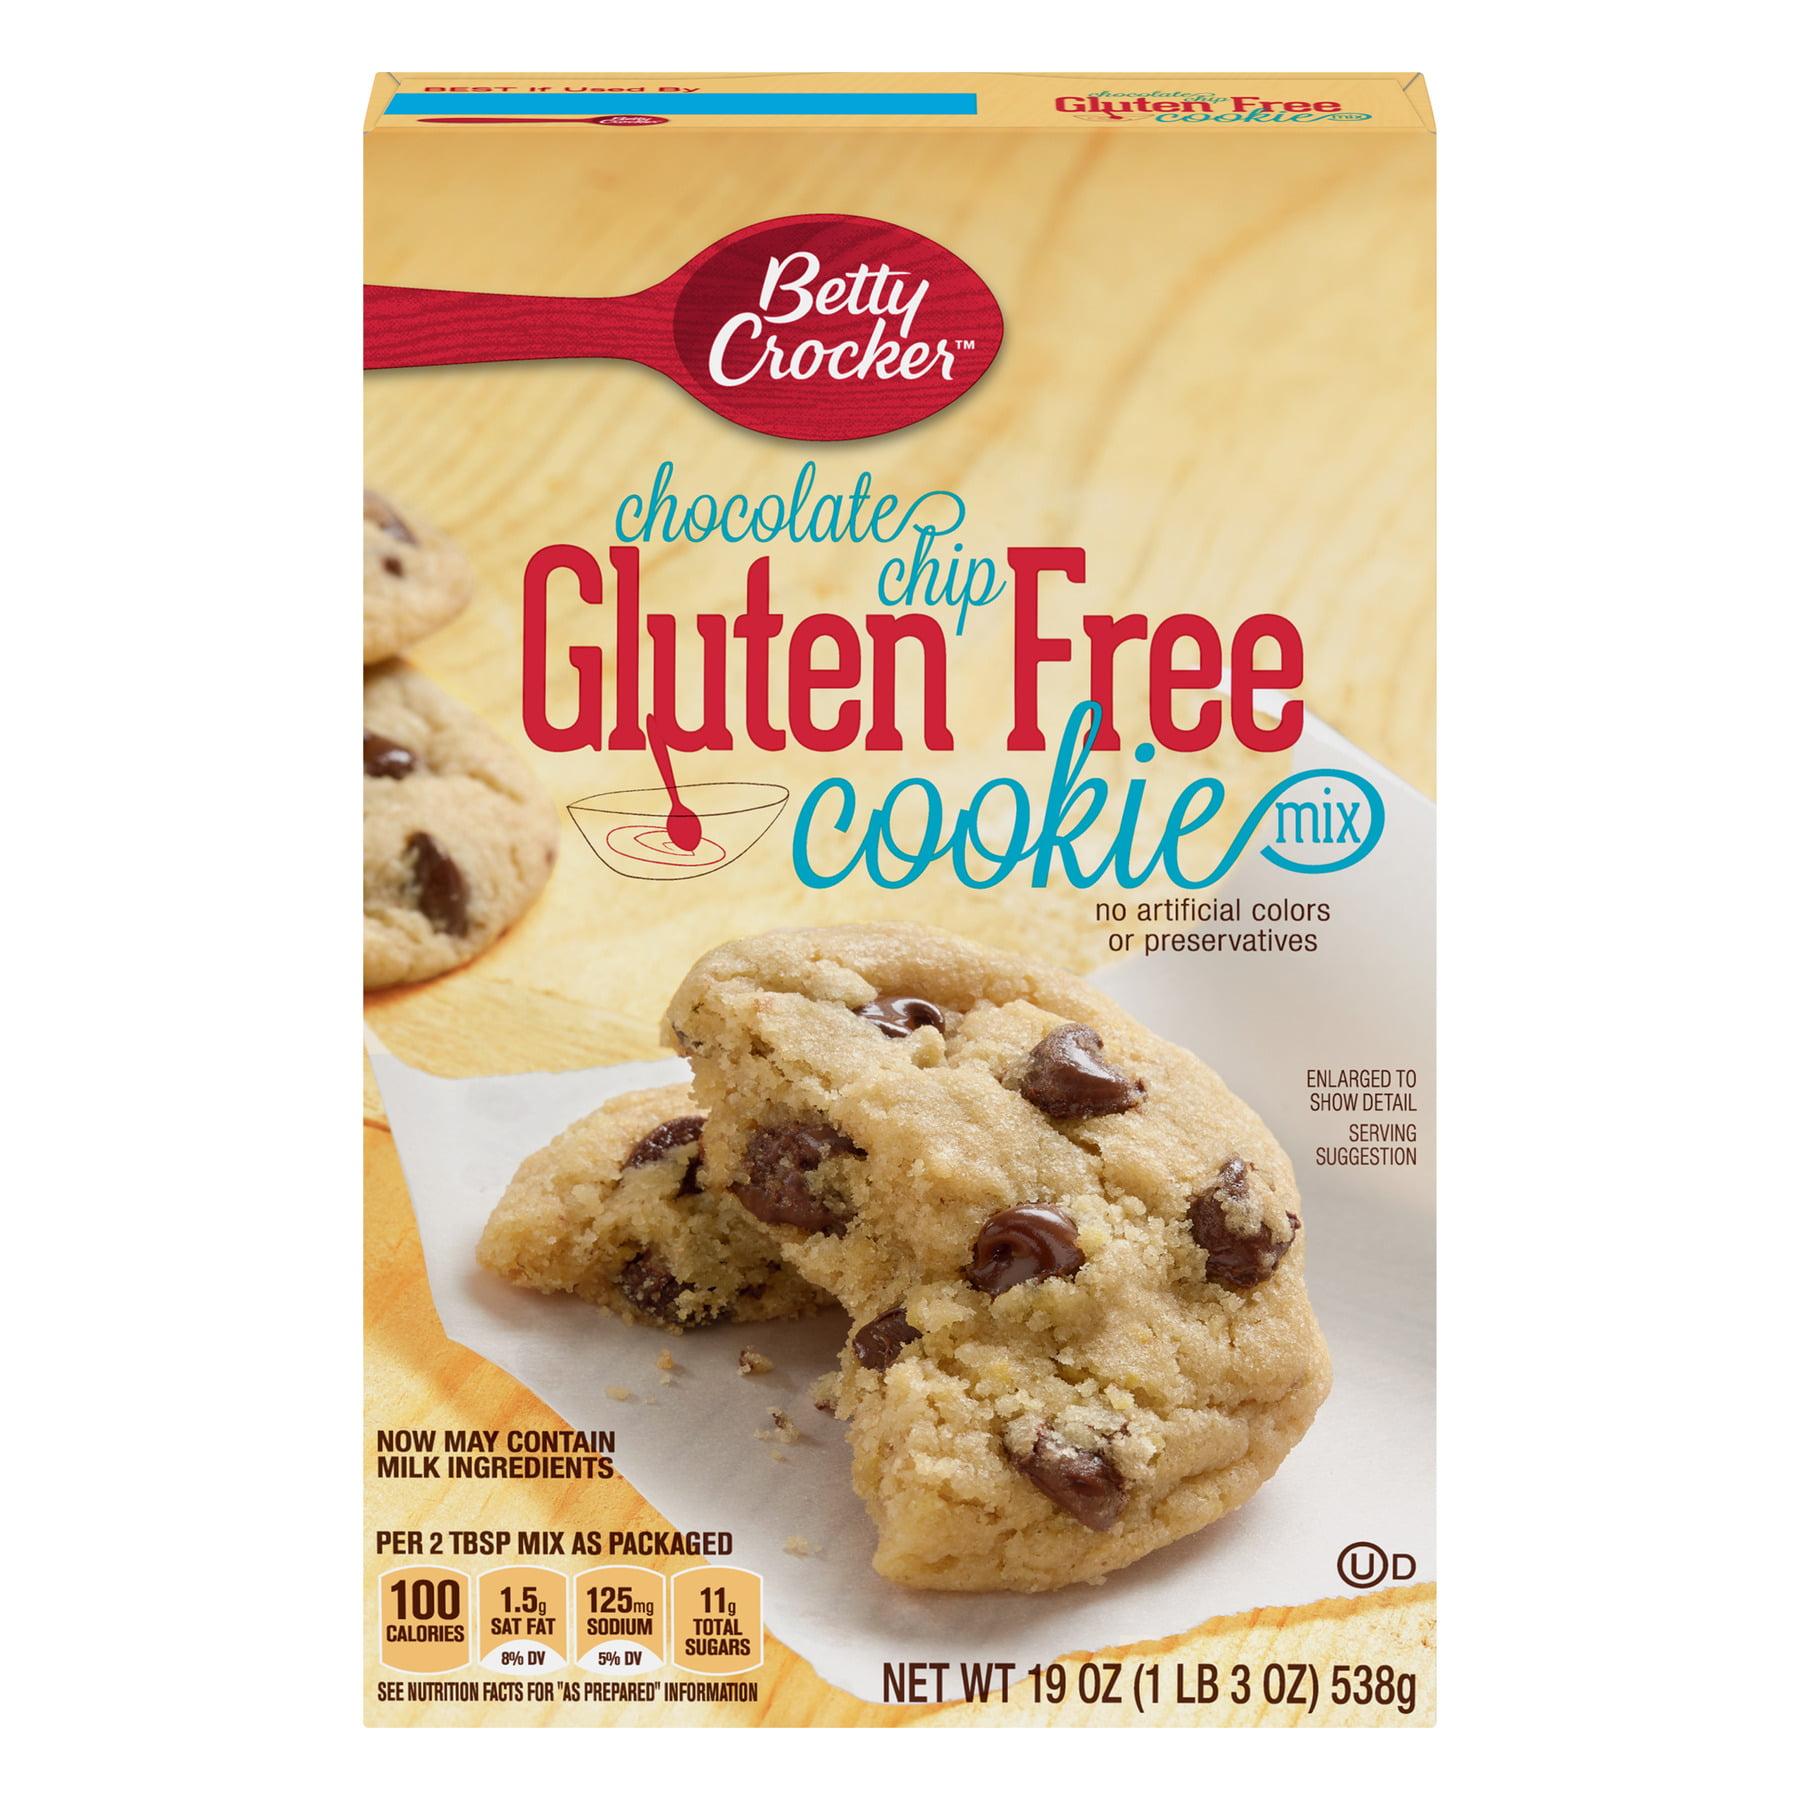 Betty Crocker Gluten Free Chocolate Chip Cookie Mix, 19 oz - Walmart.com